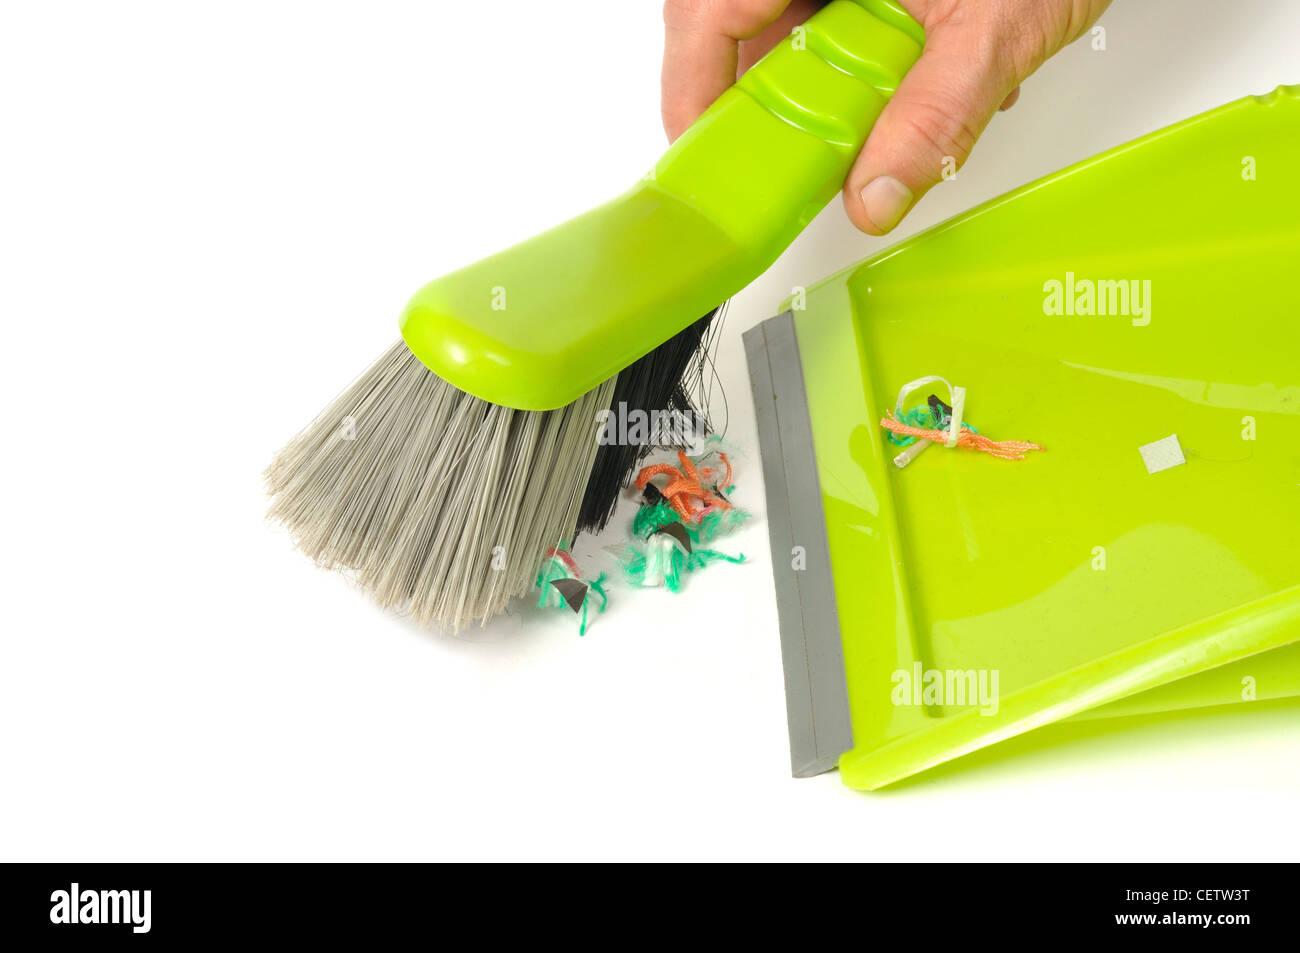 Brush and Dustpan - Stock Image